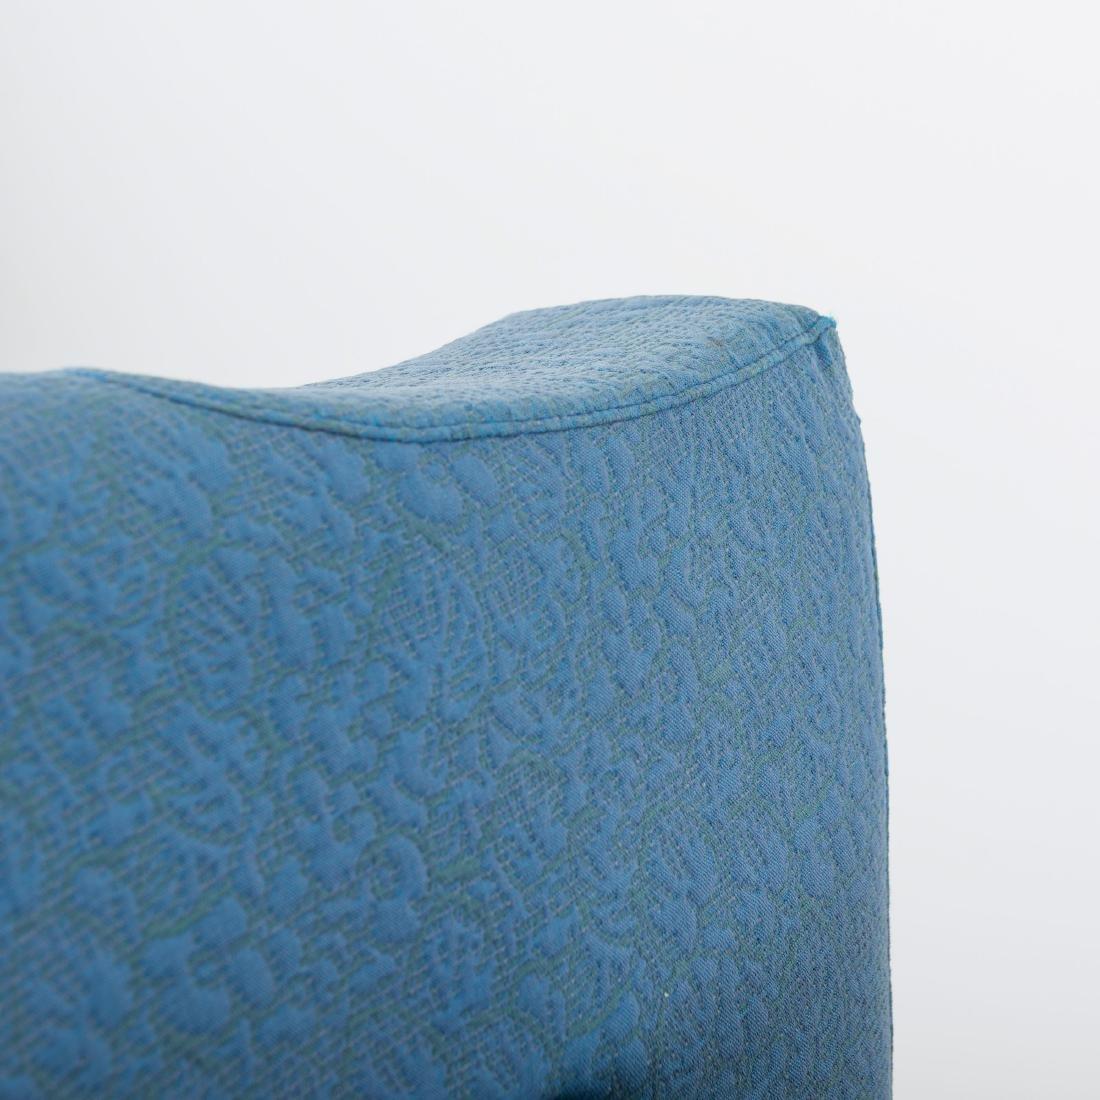 'Papillon' chair - 'Prosim Sedni', 1987 - 7